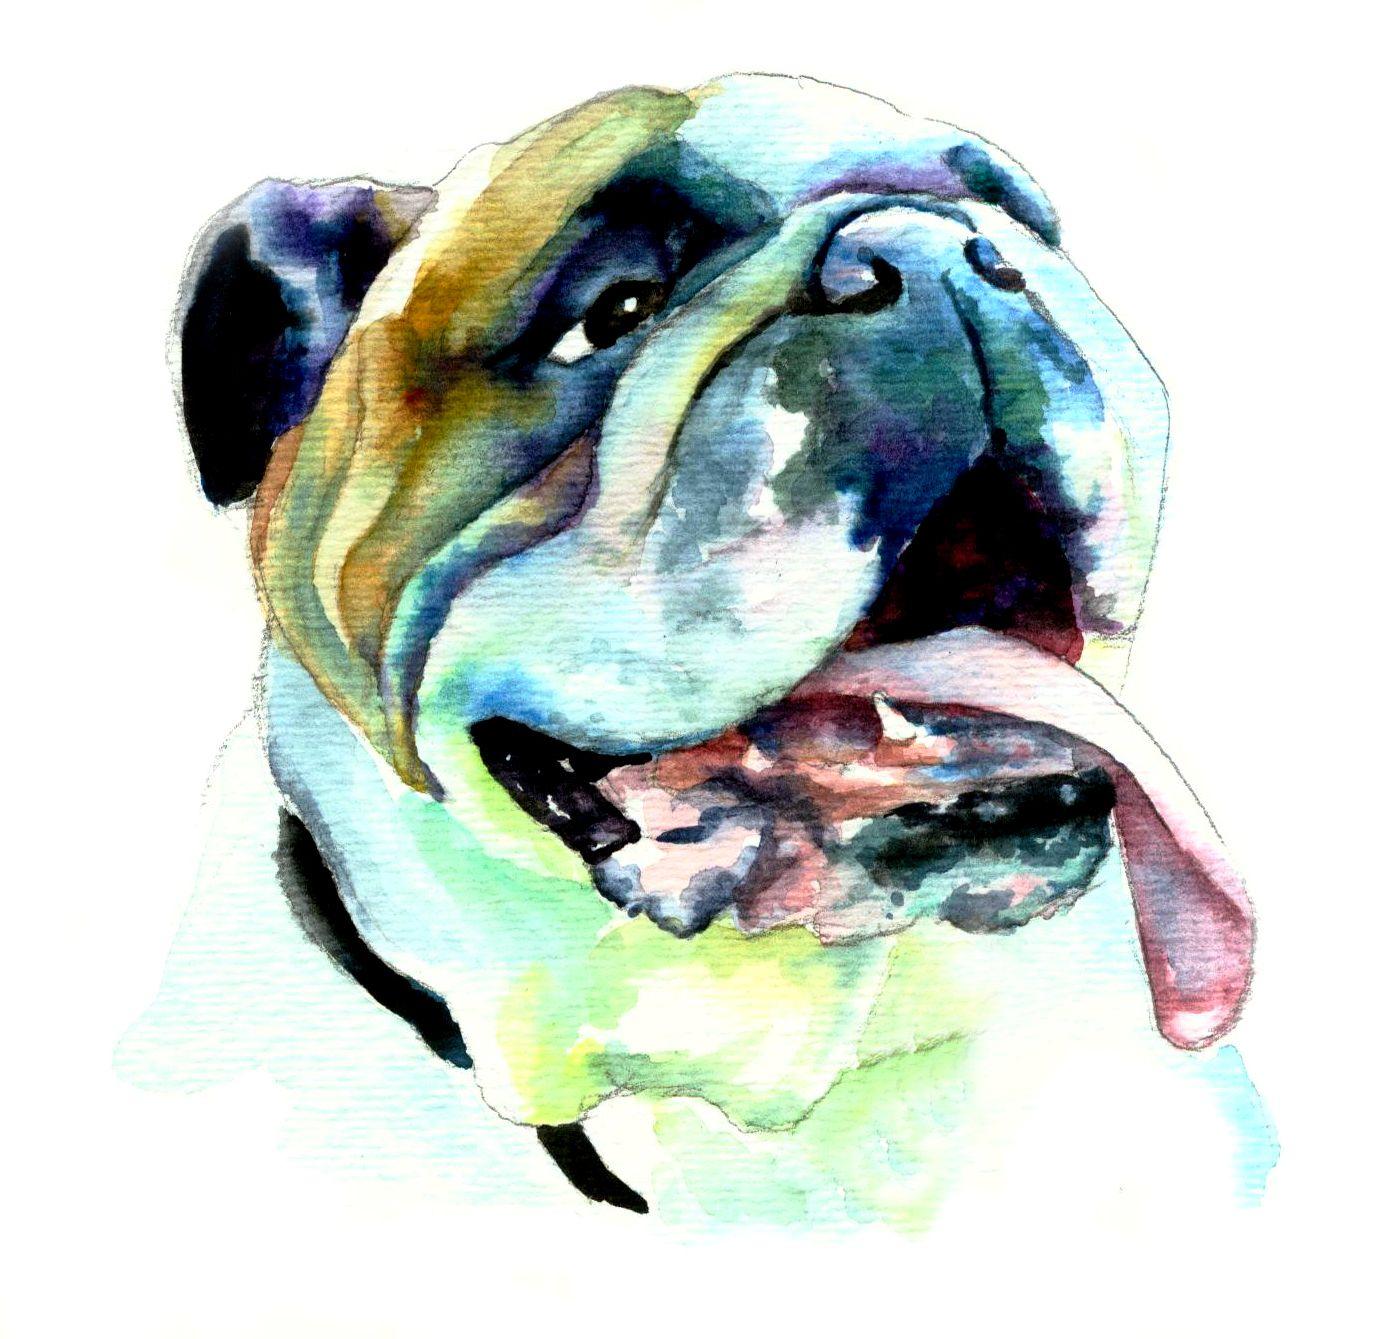 English Bulldog Freckle Face Www Christystudios Com Bulldog Art Bulldog Images Dog Portraits